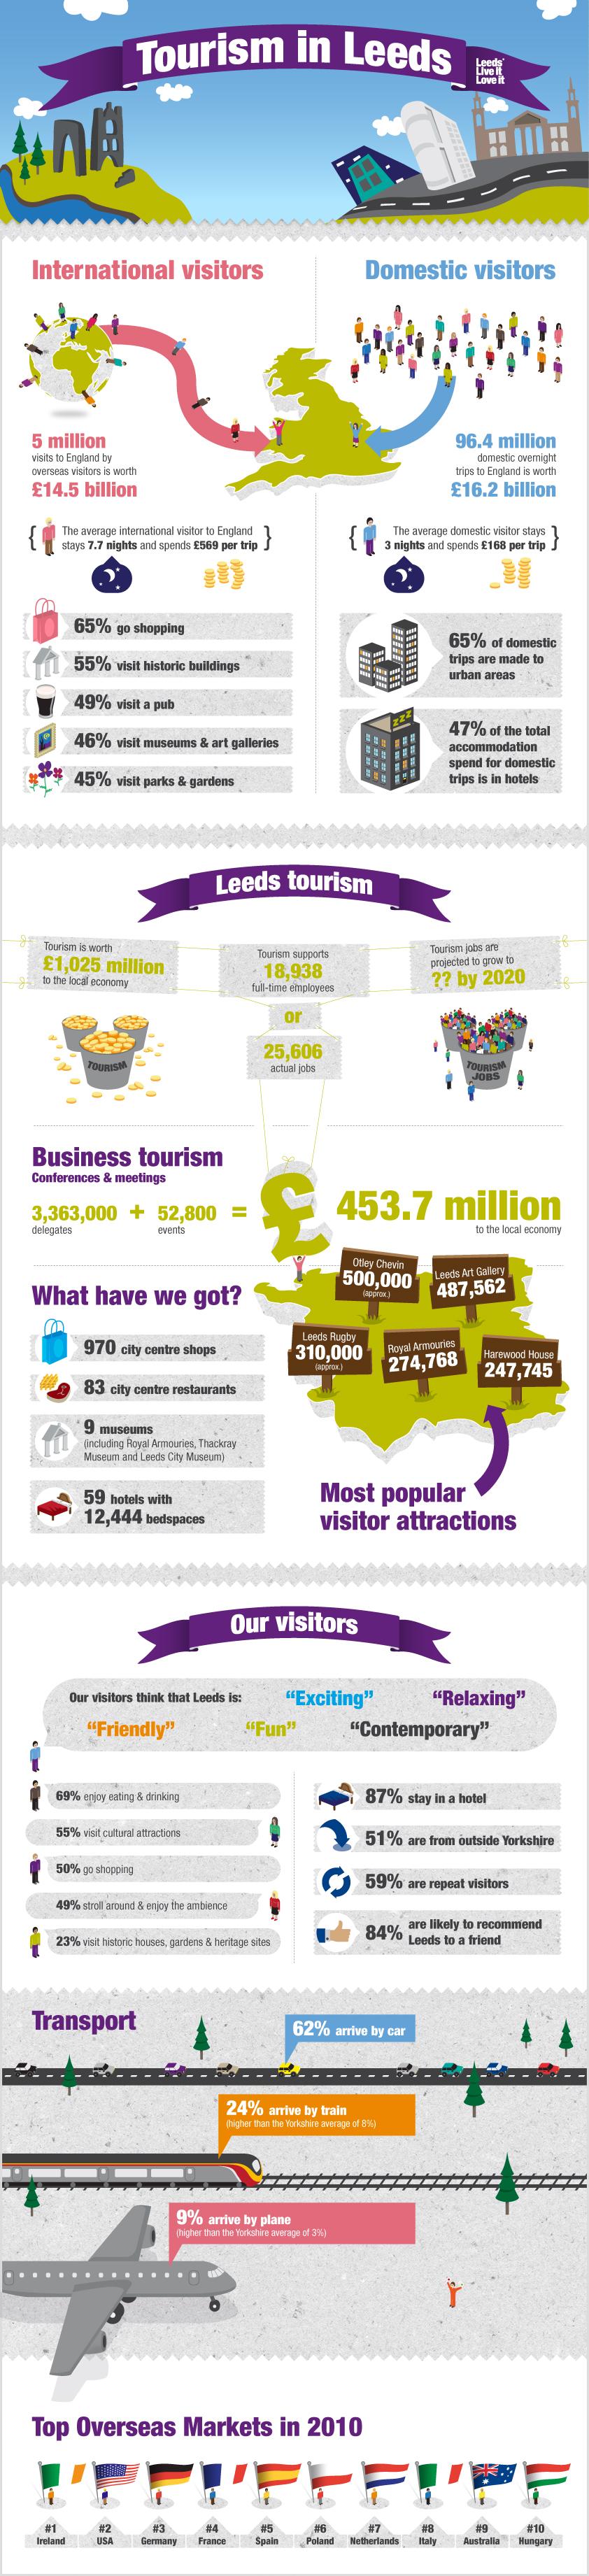 leeds-tourism-visitor-stats_50ade5735c393